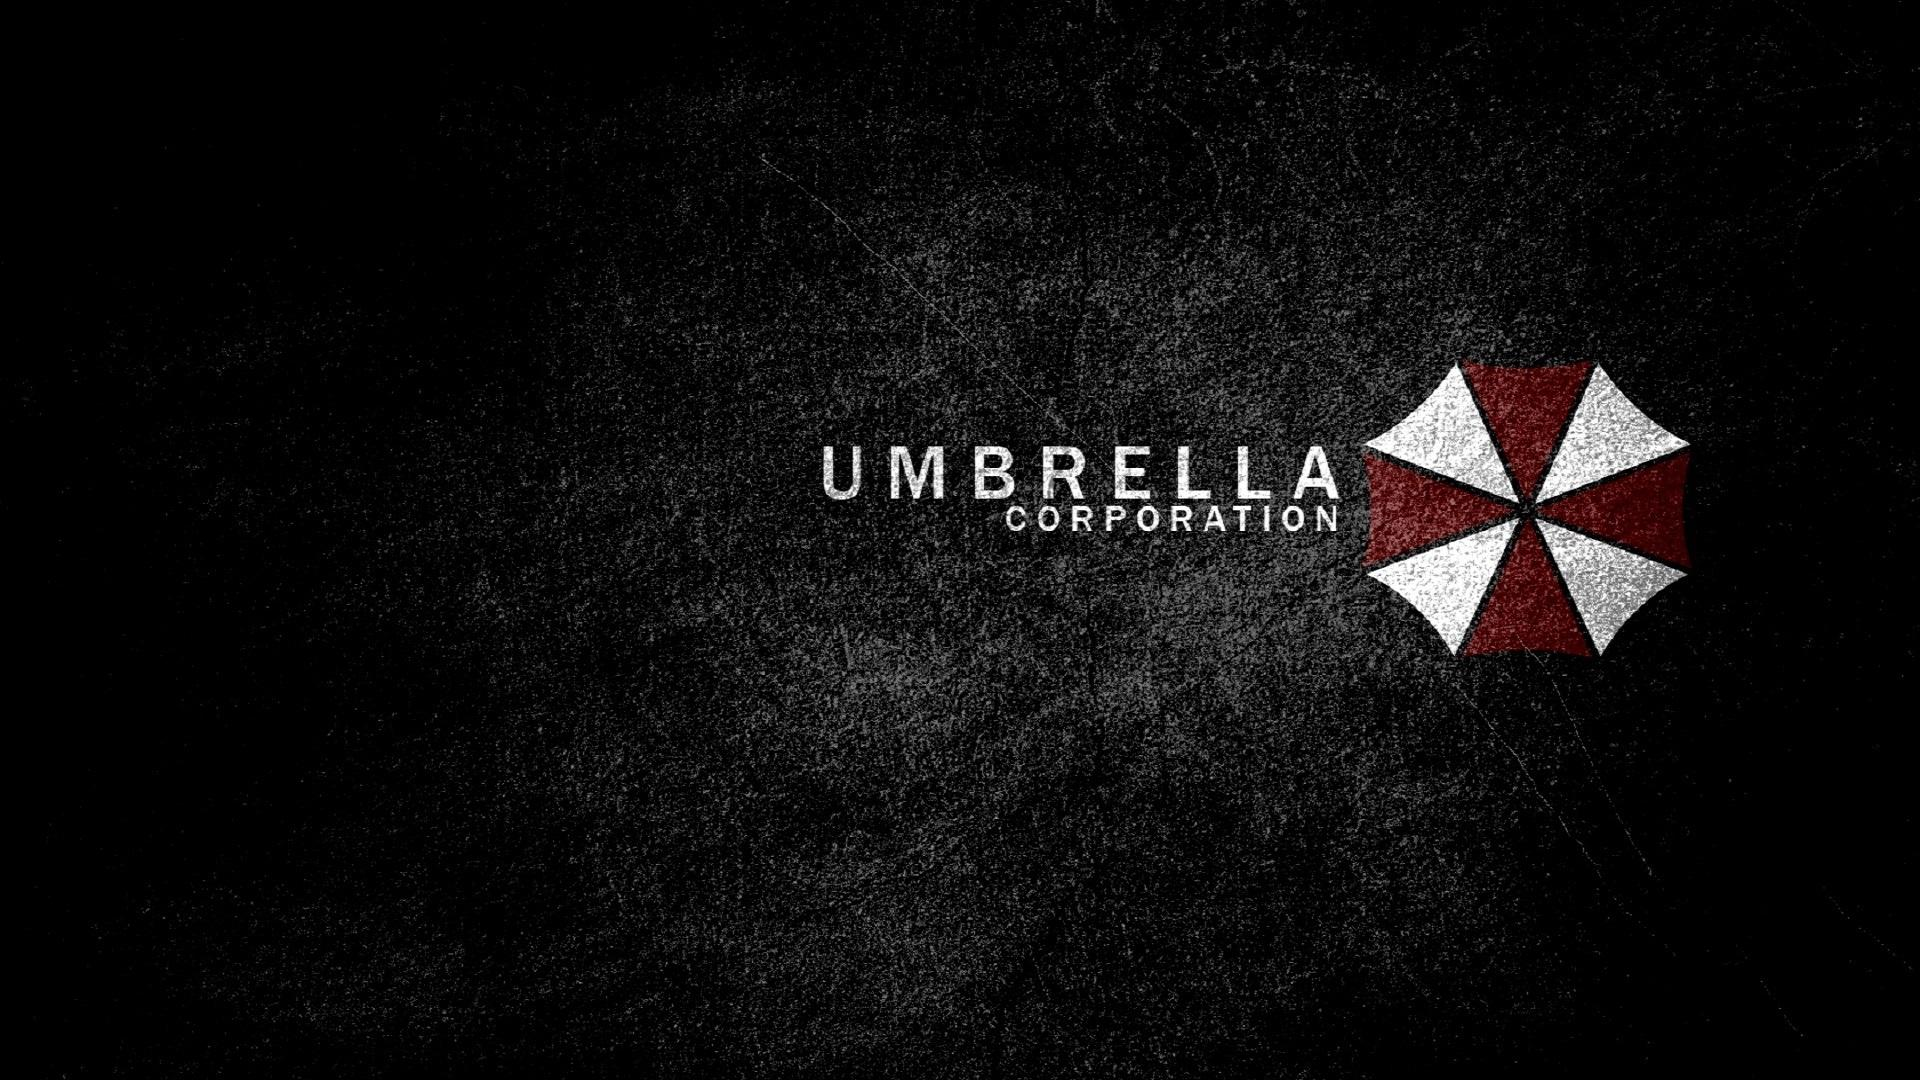 72+] Resident Evil Hd Wallpaper on WallpaperSafari